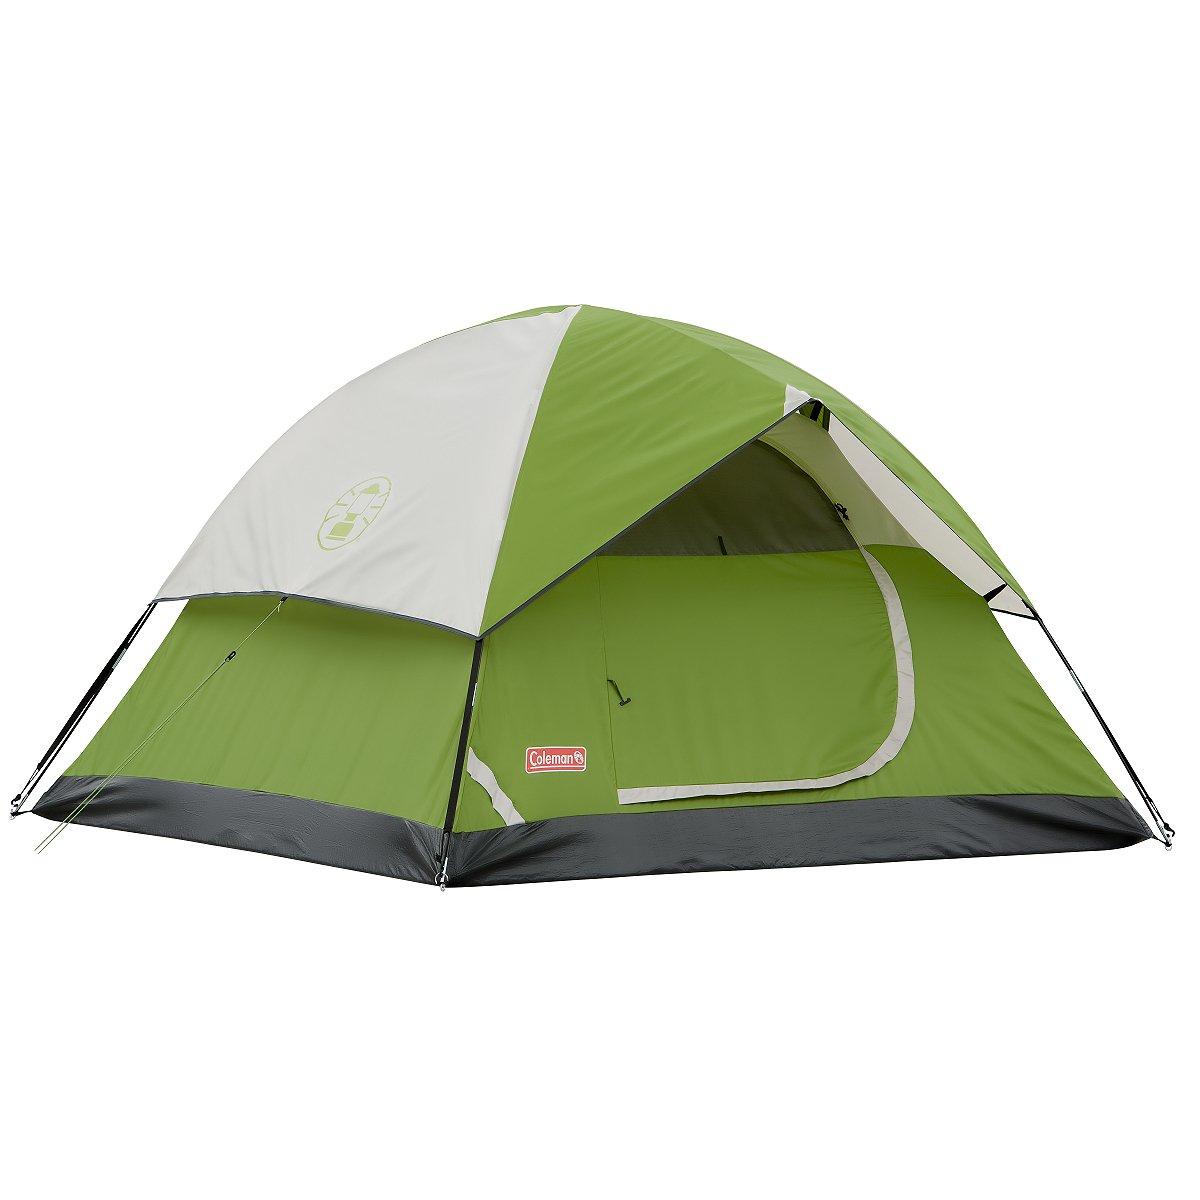 Coleman Sundome 3 7'x7' - 3 Person Tent